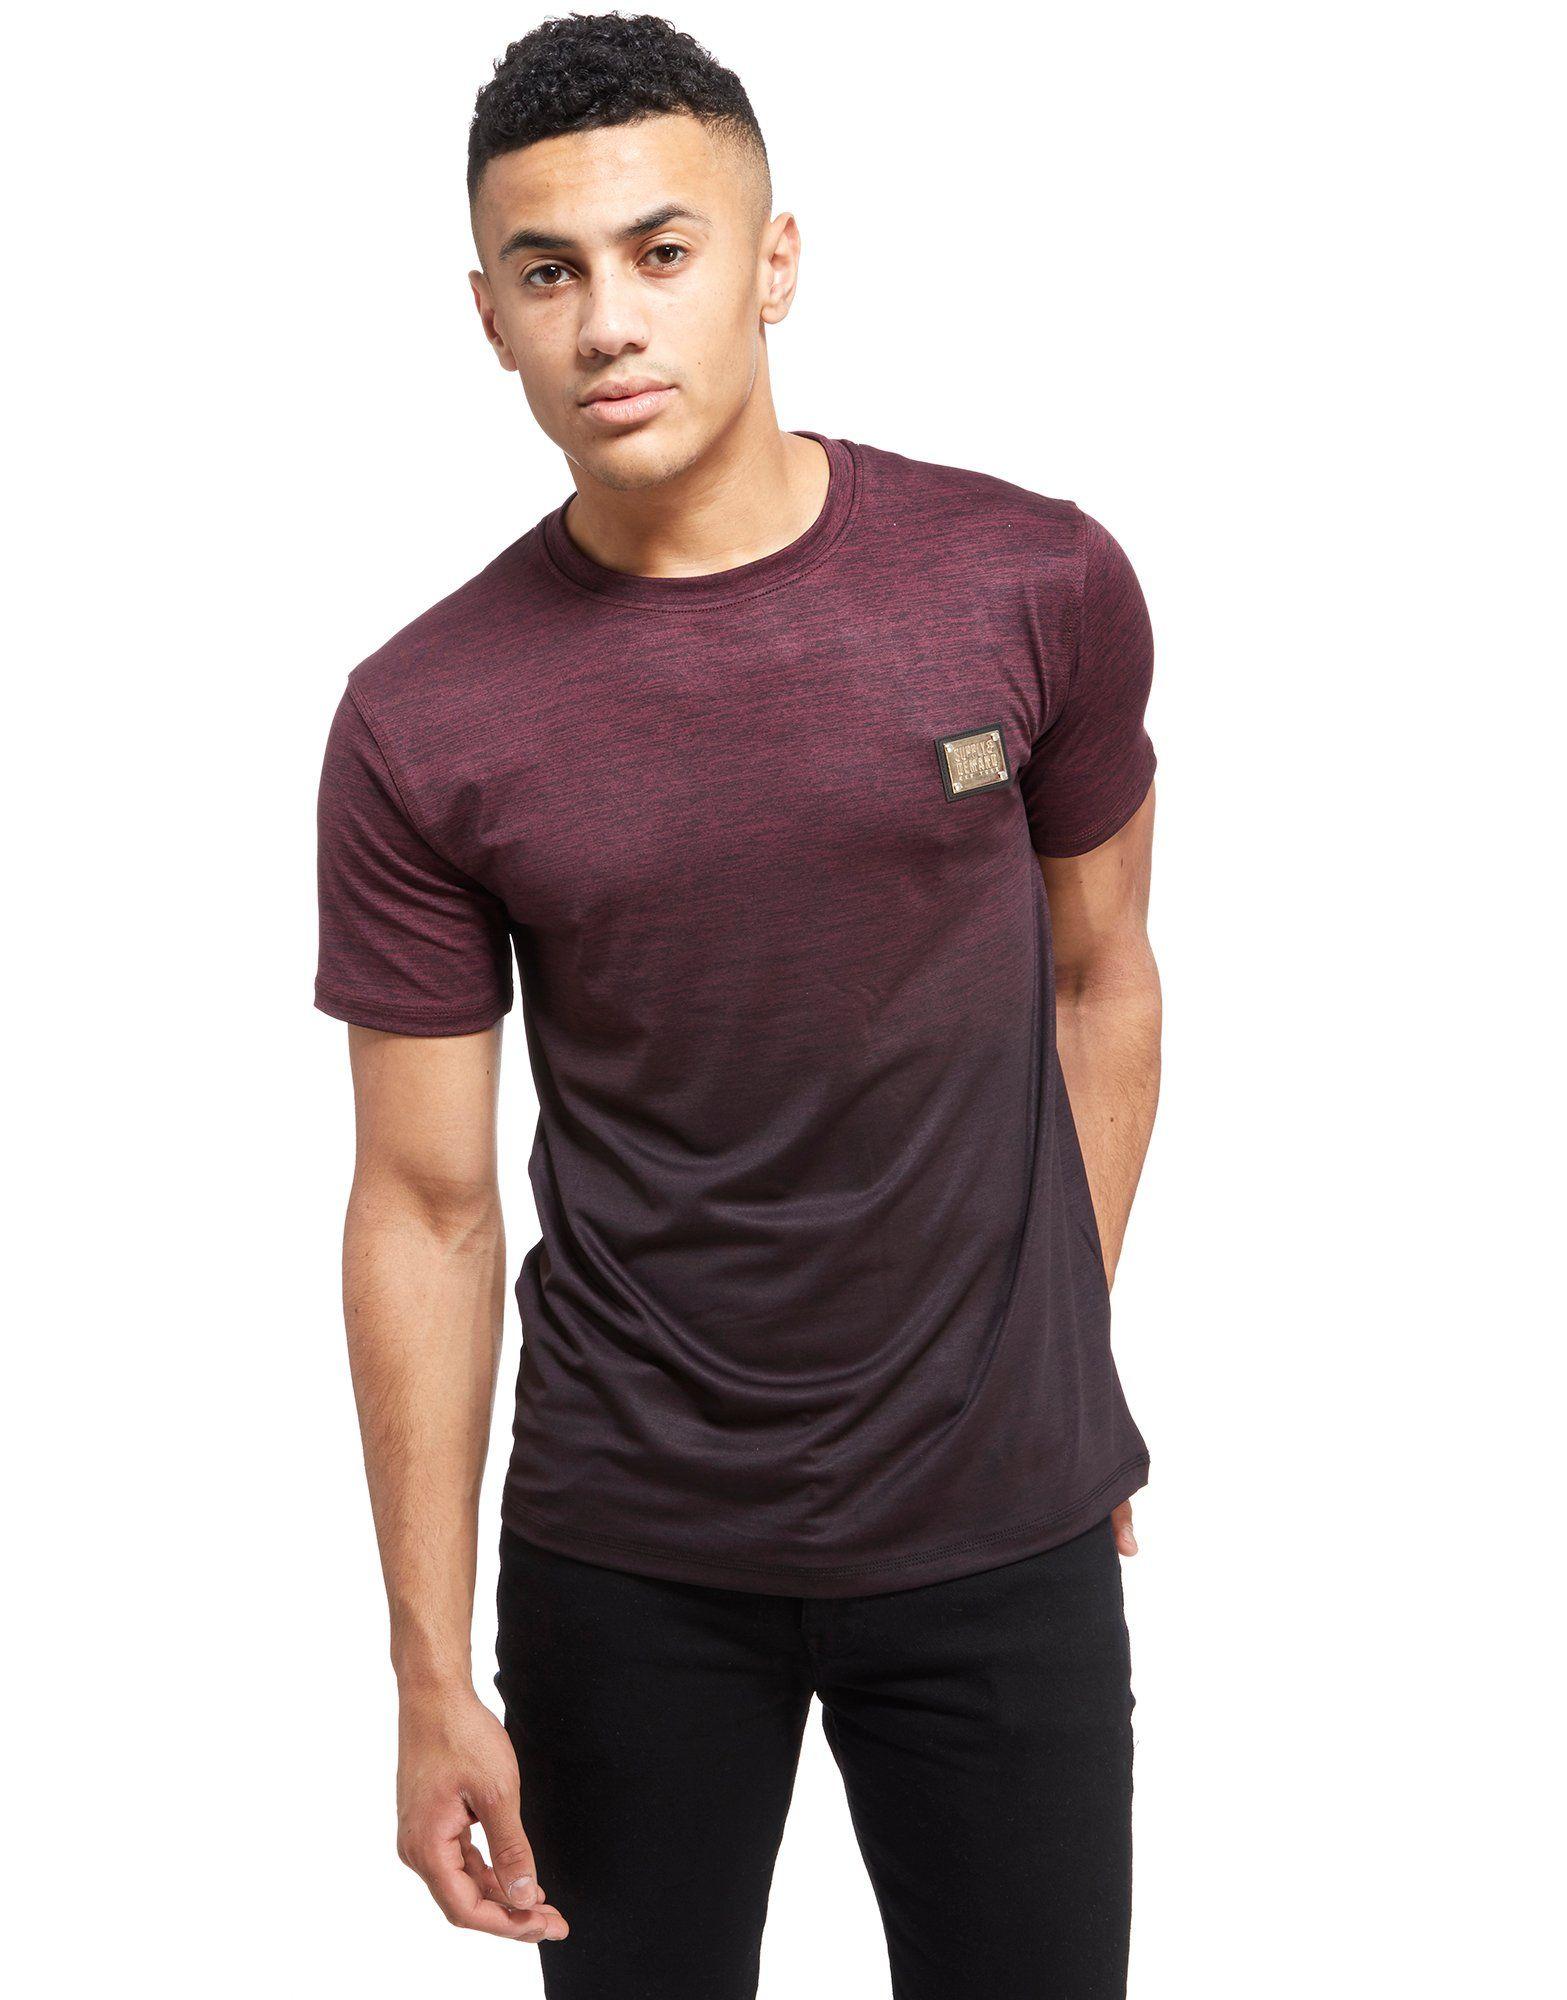 Design your own t shirt ebay - Supply Demand Hendrick Fade T Shirt